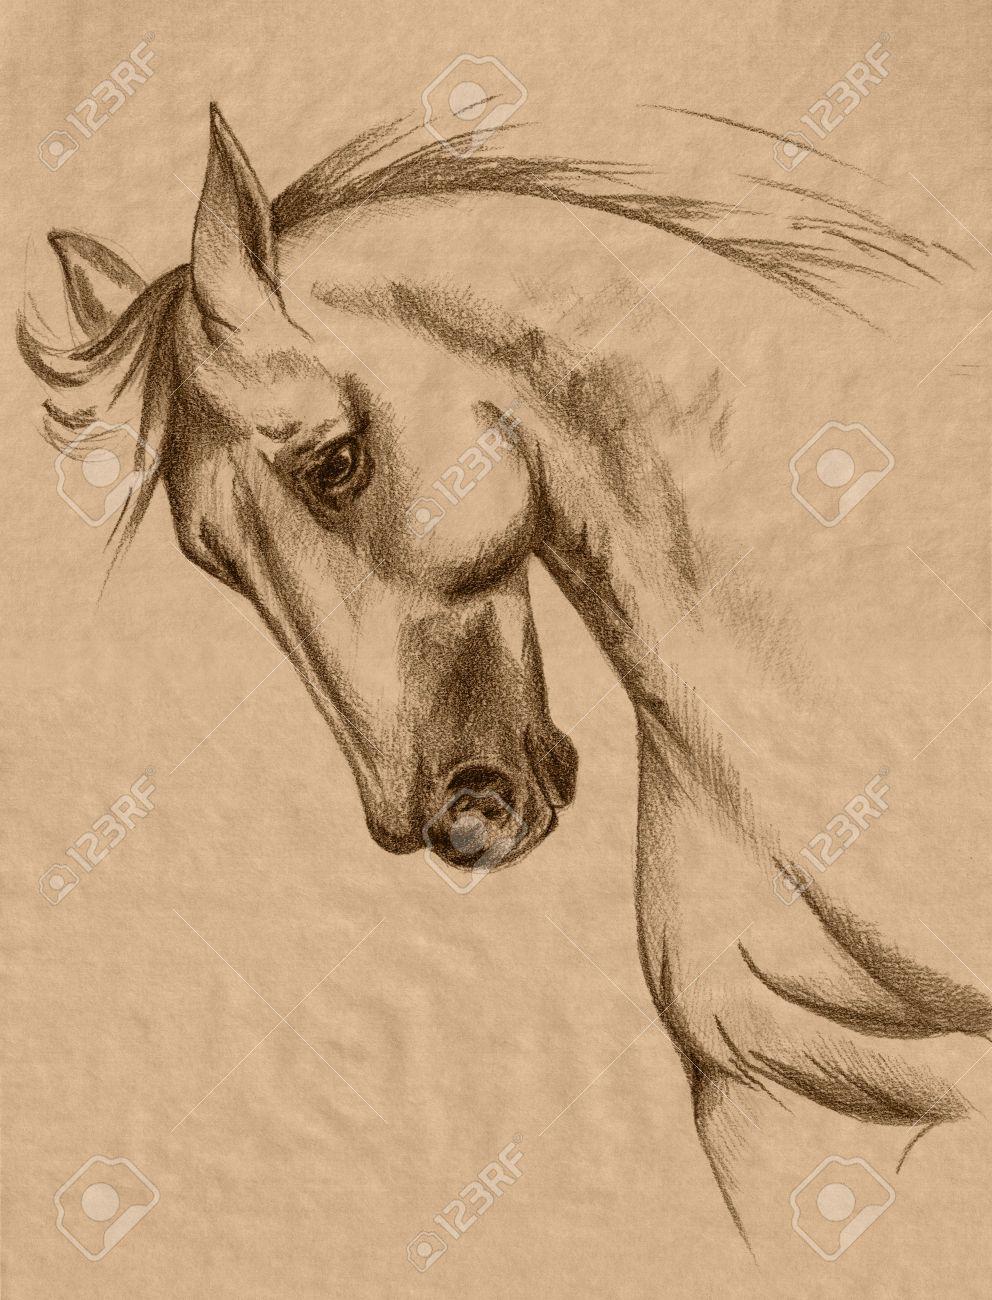 26815107-cabeza-de-caballo-de-la-sepia-a-mano-alzada-tonos-dibujo ...